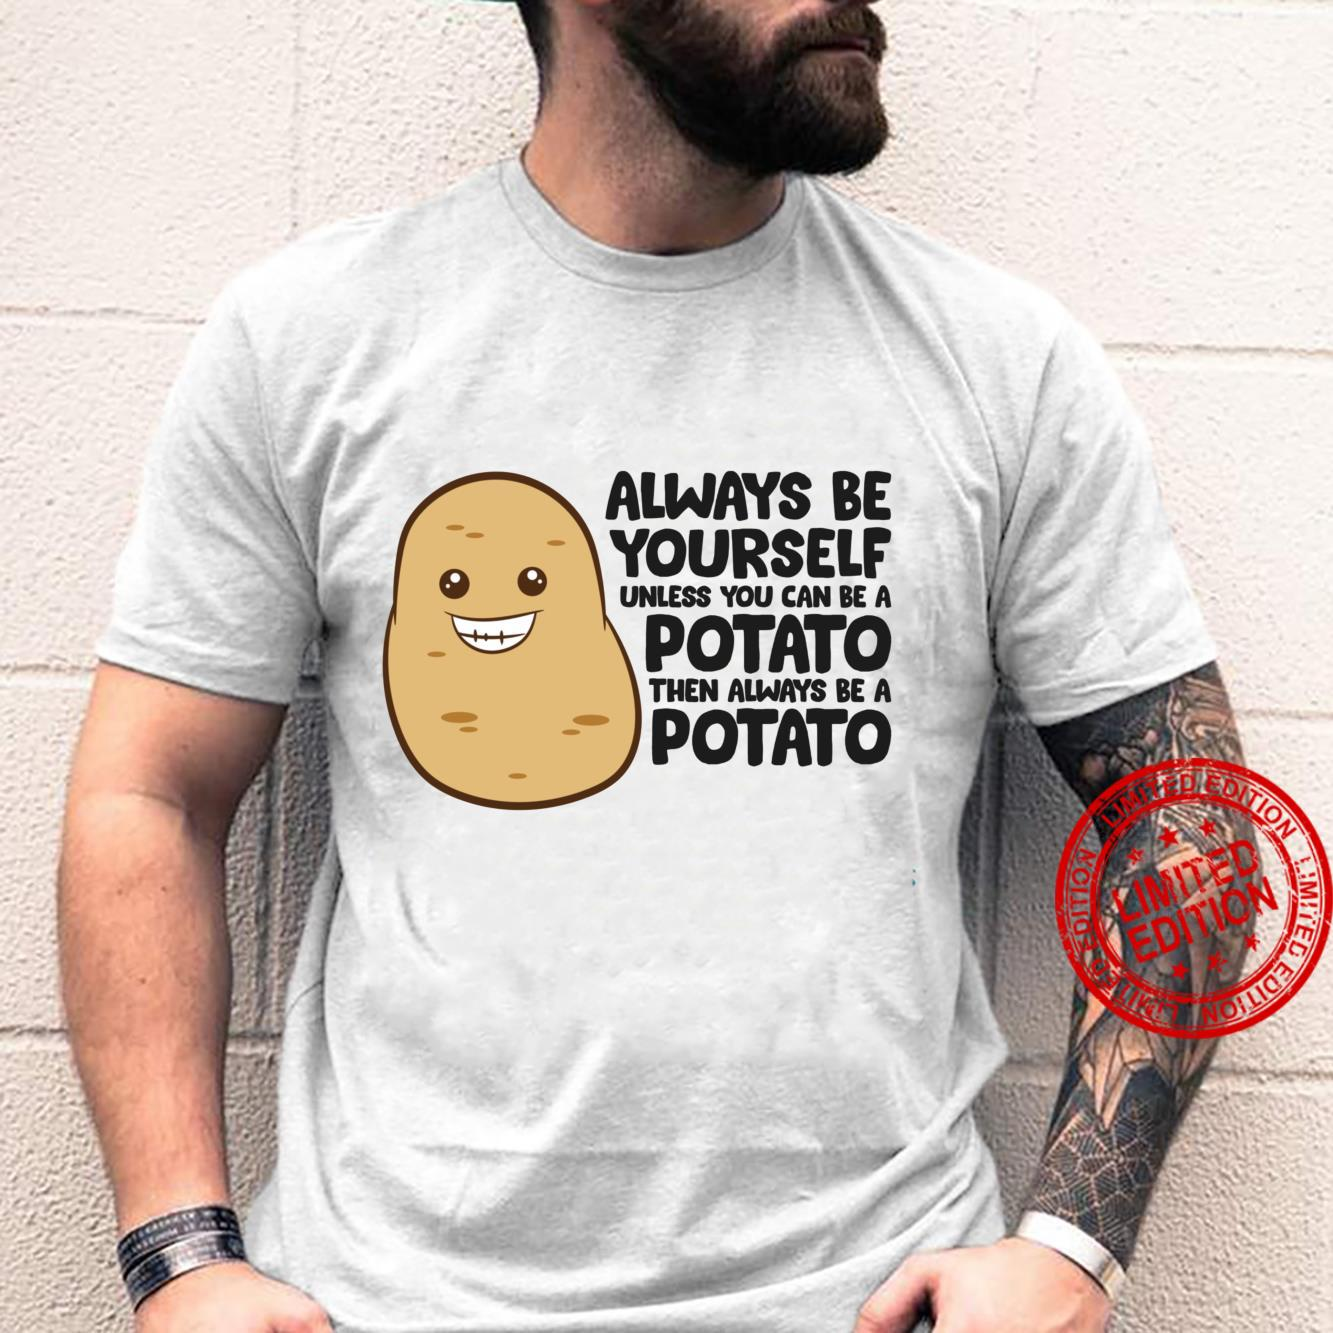 Always Be Yourself T-Shirt Potato Lover T-Shirt Funny Potato T-Shirt